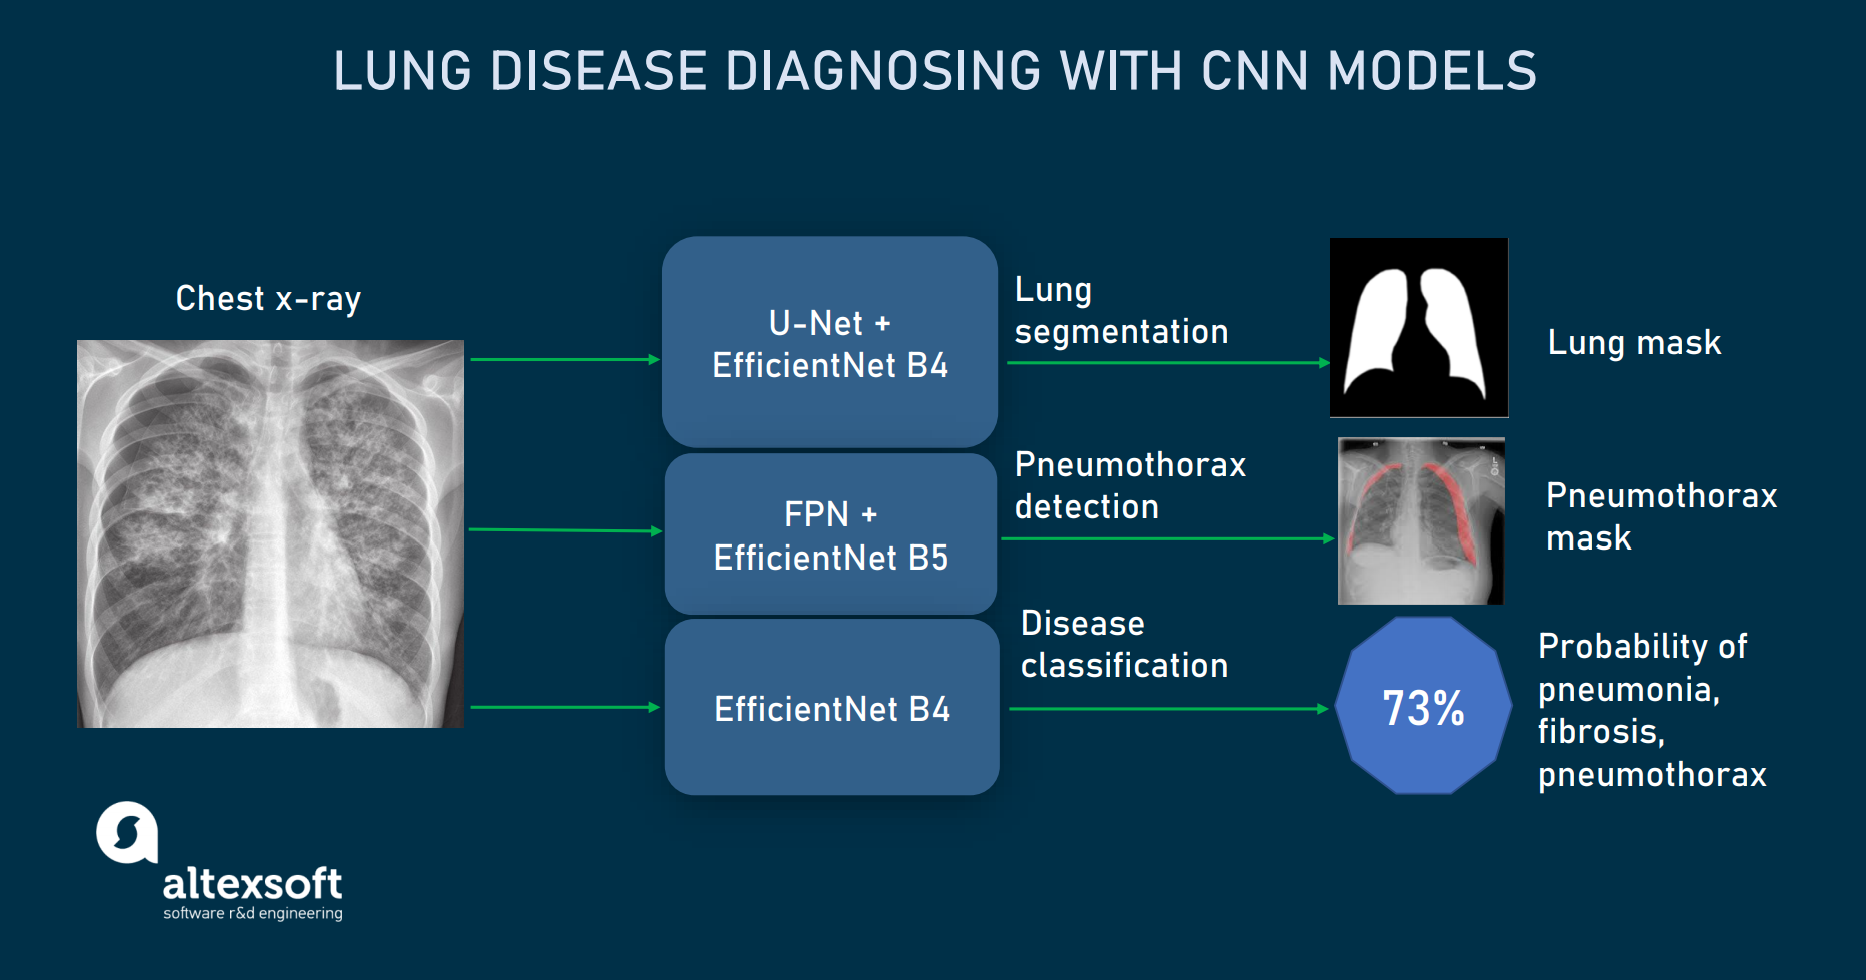 CNN models in lung disease detection